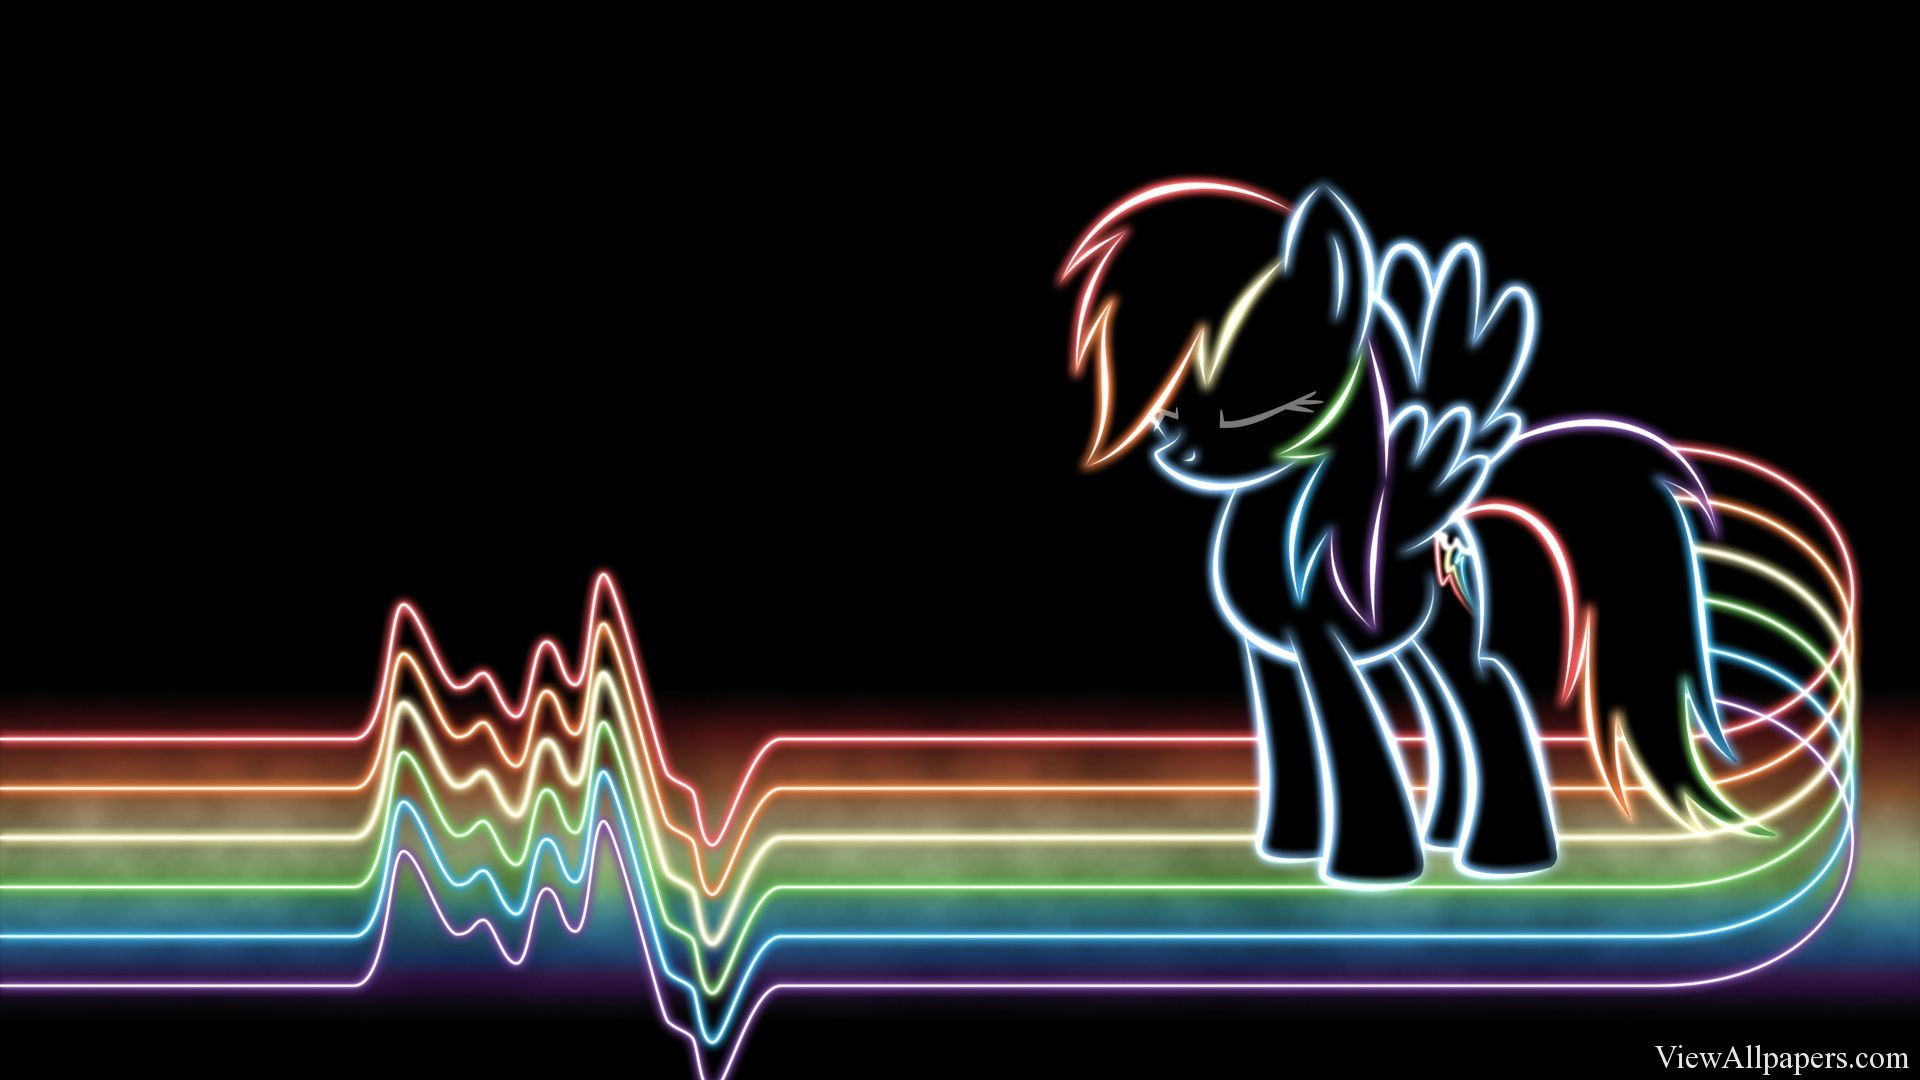 Rainbow Dash Glow Hd Wallpaper By Smockhobbes High Resolution